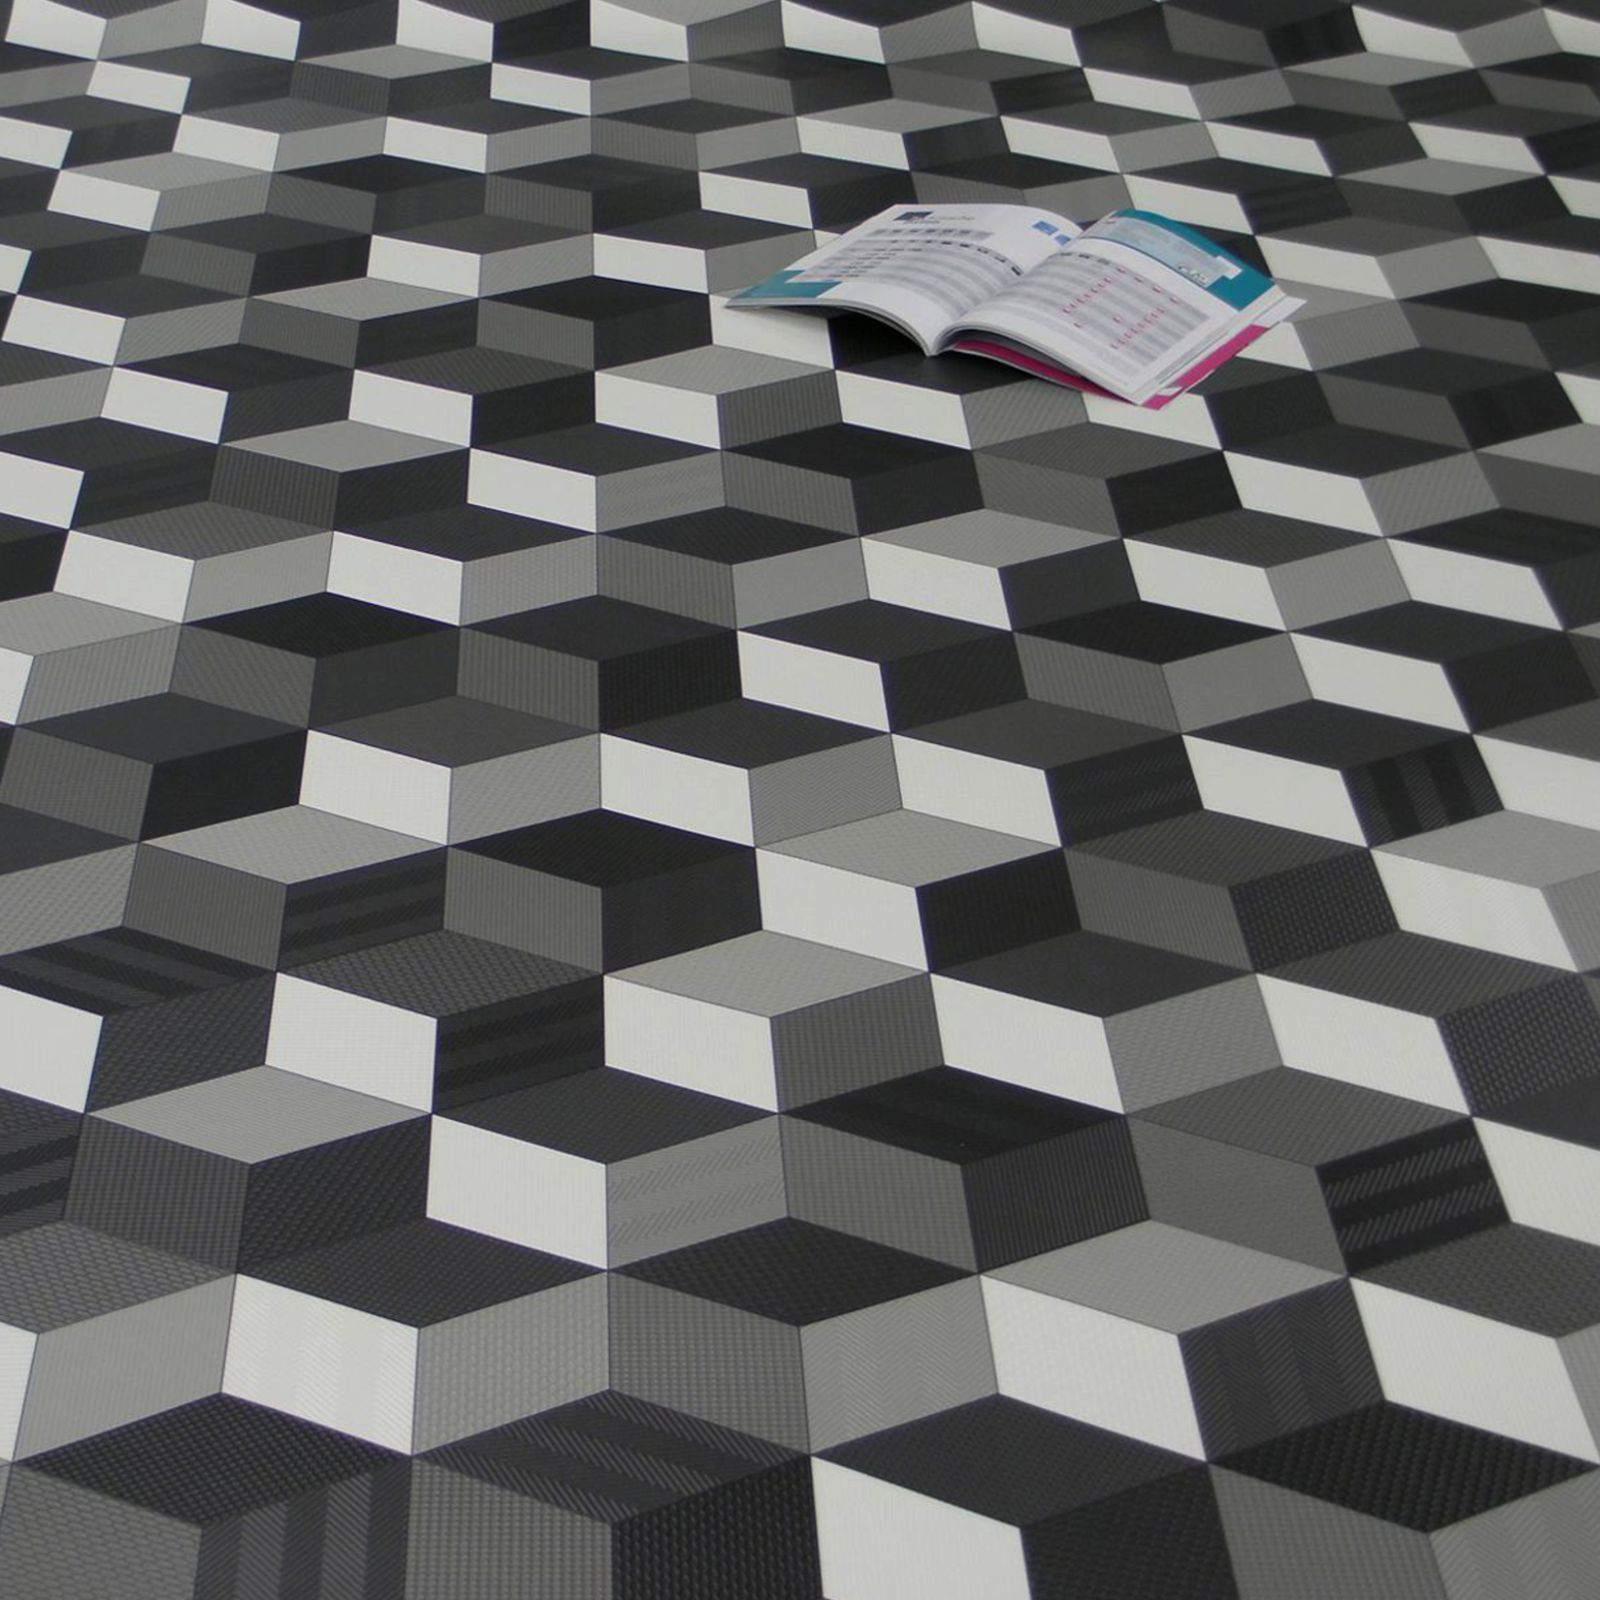 PVC Bodenbelag Cube 3D Würfel Schwarz Weiß Grau